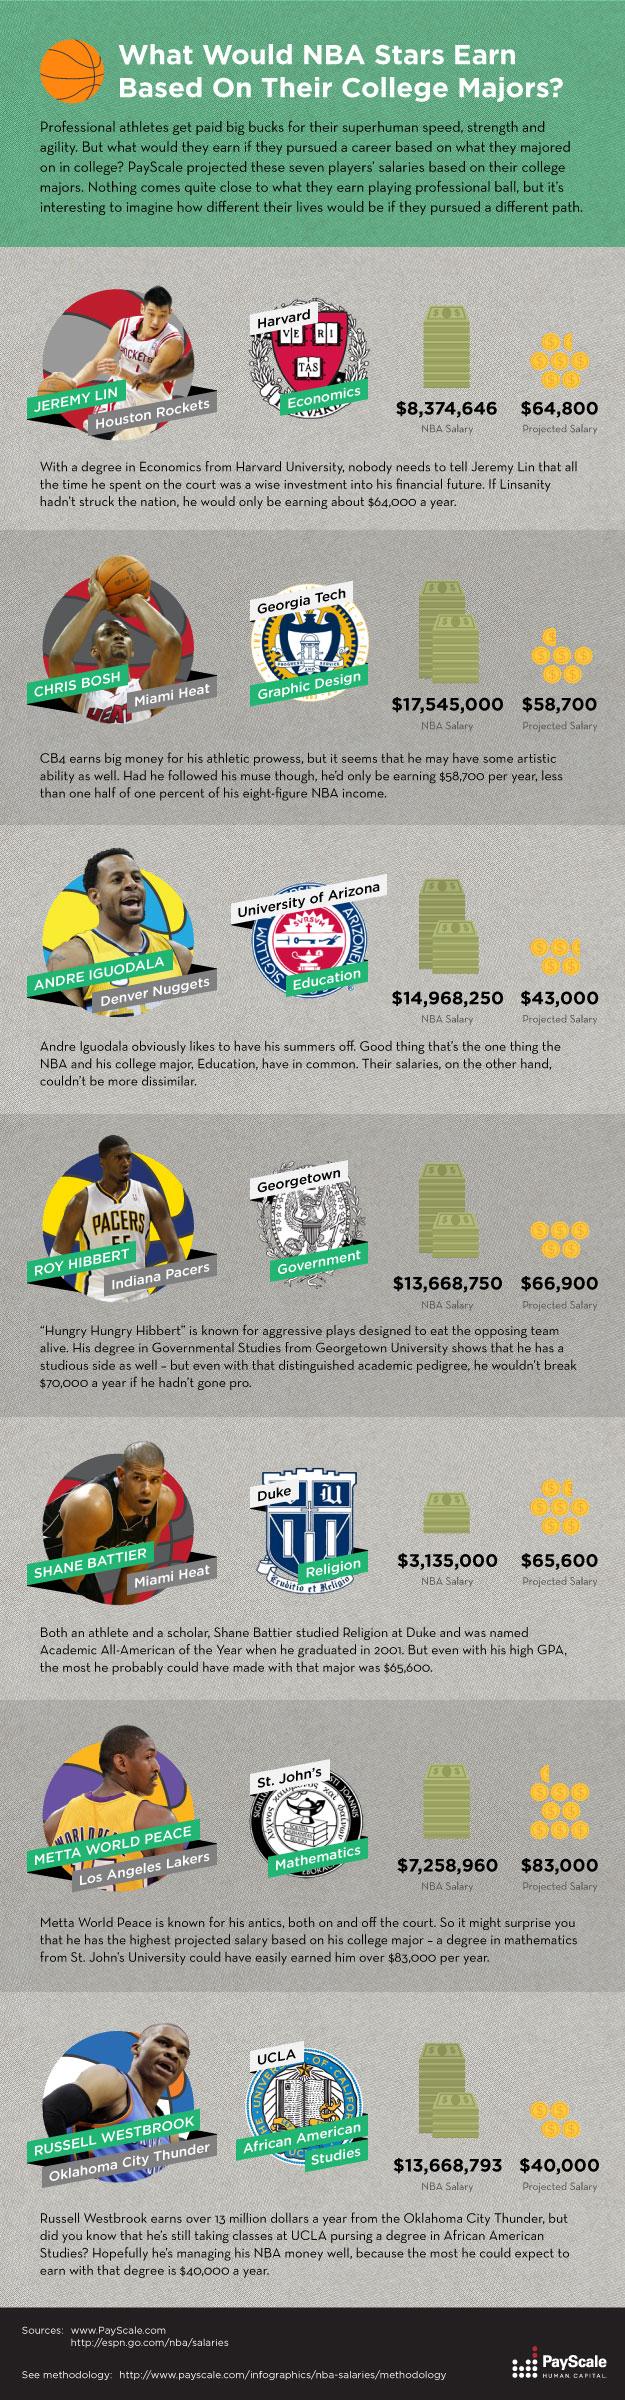 NBA Star Earnings